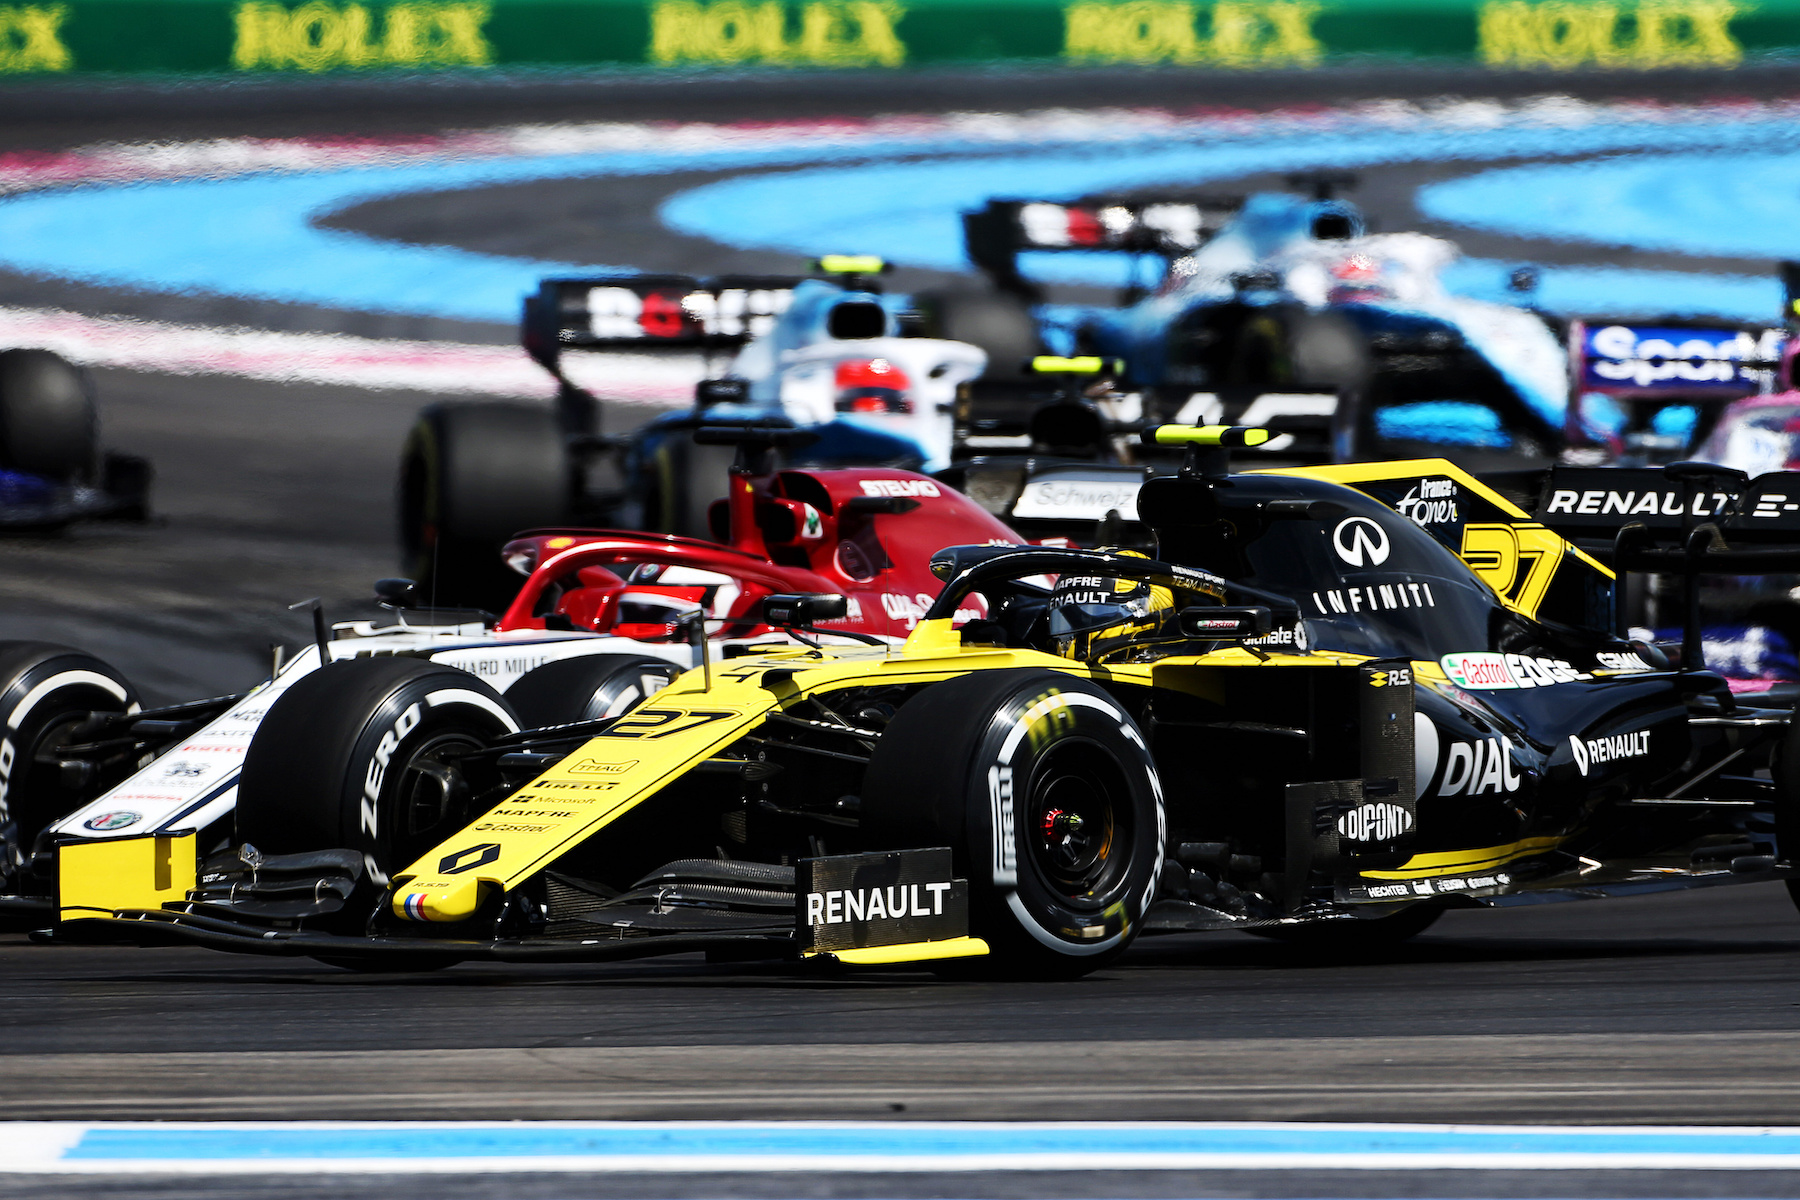 3 2019 French GP Sunday 36.jpg